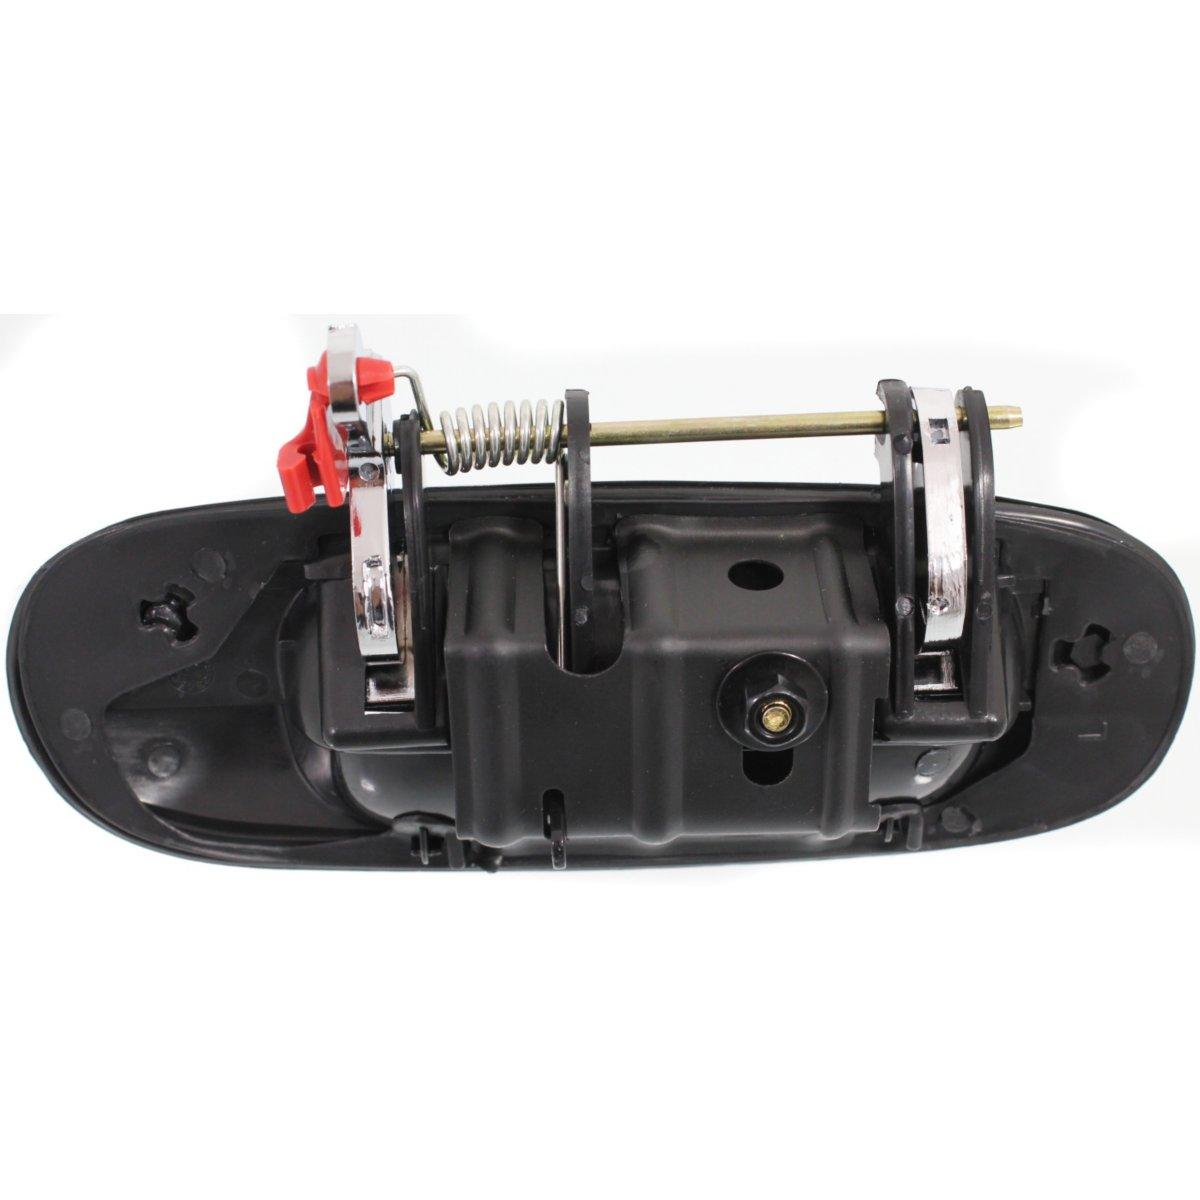 Chevy Trailblazer Parts Autos Post